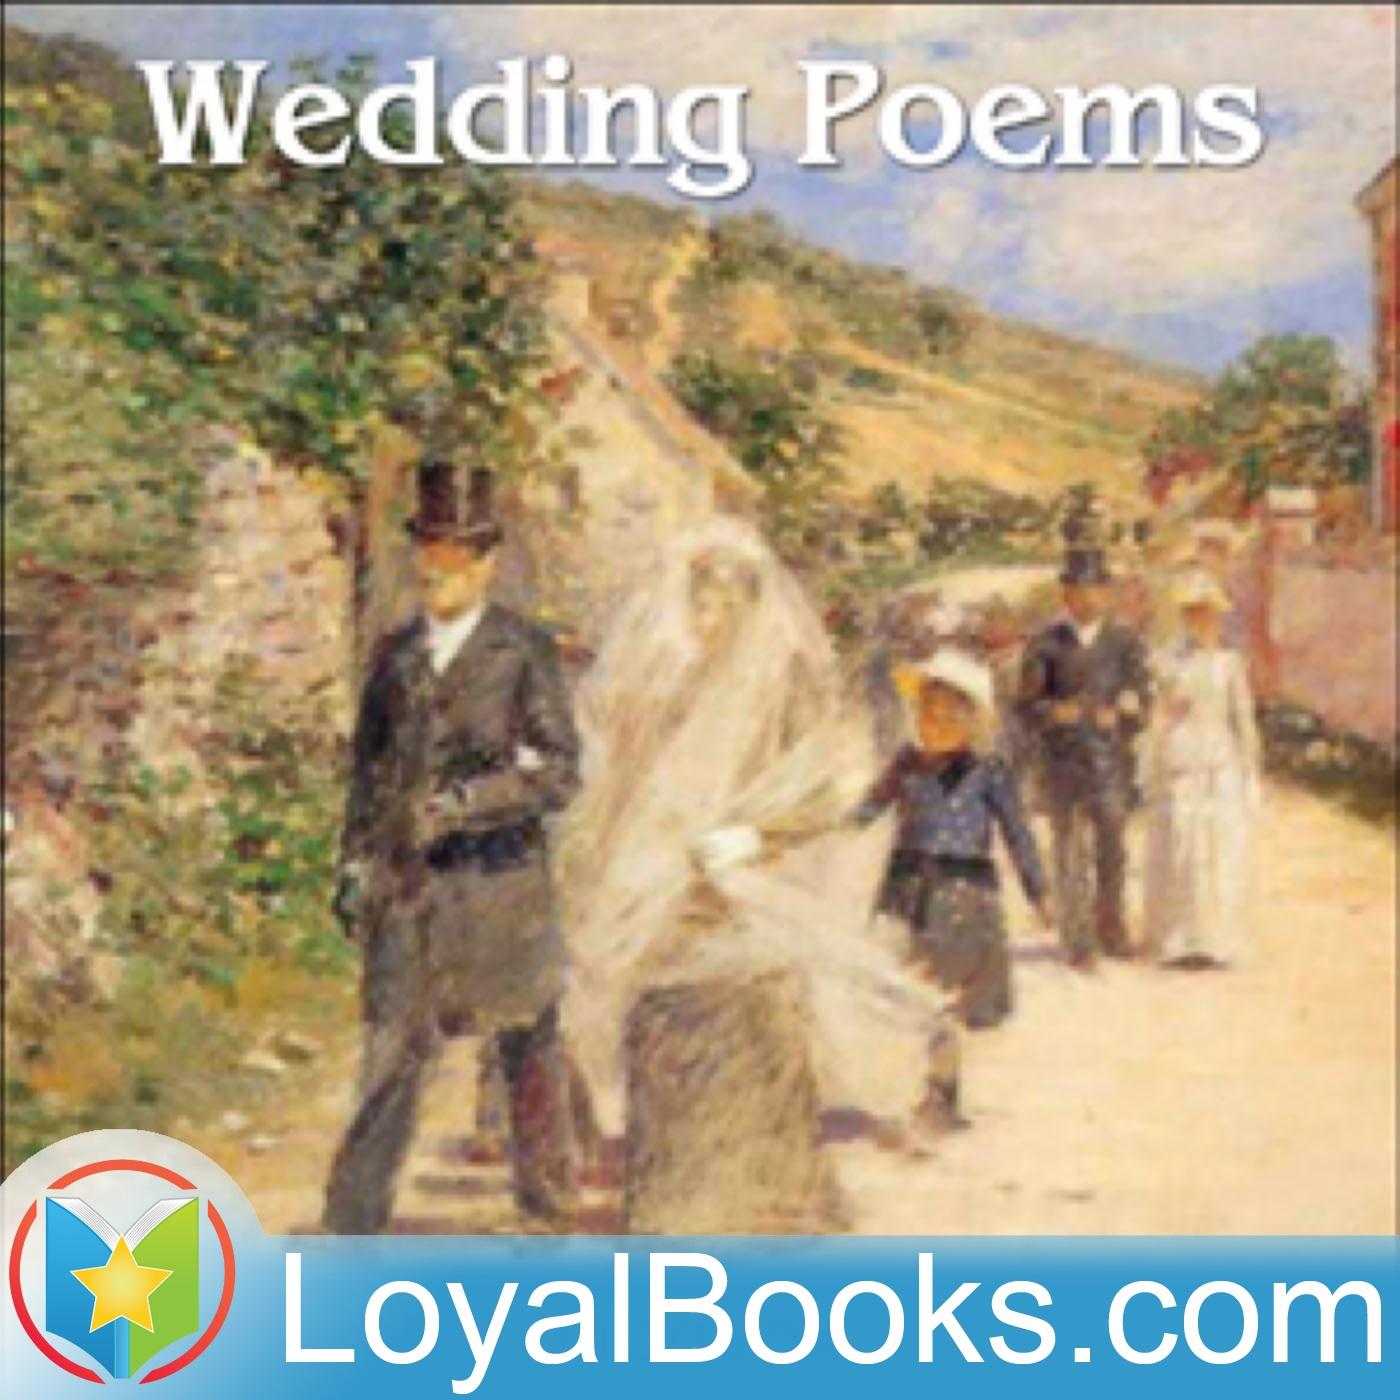 <![CDATA[Wedding Poems by Unknown]]>